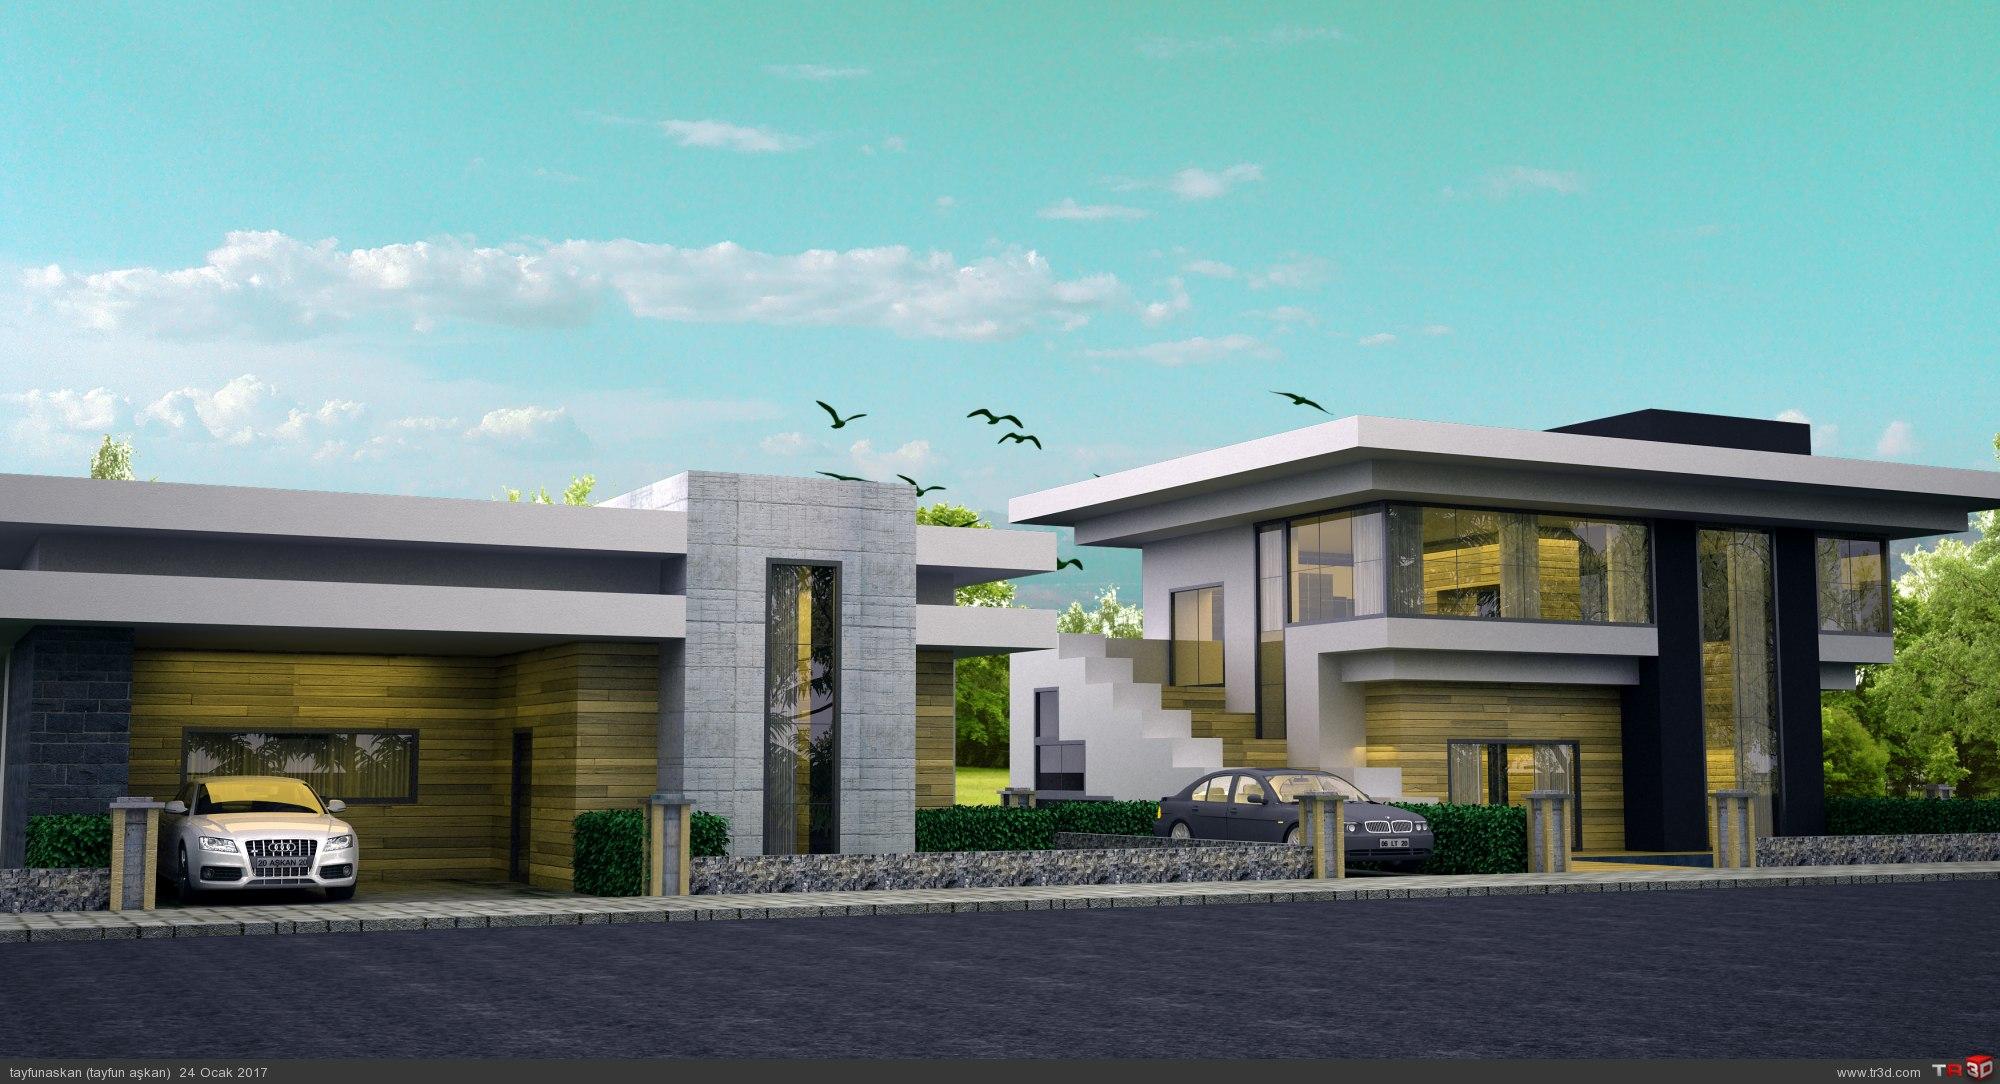 Hayaller Dünyası Villa